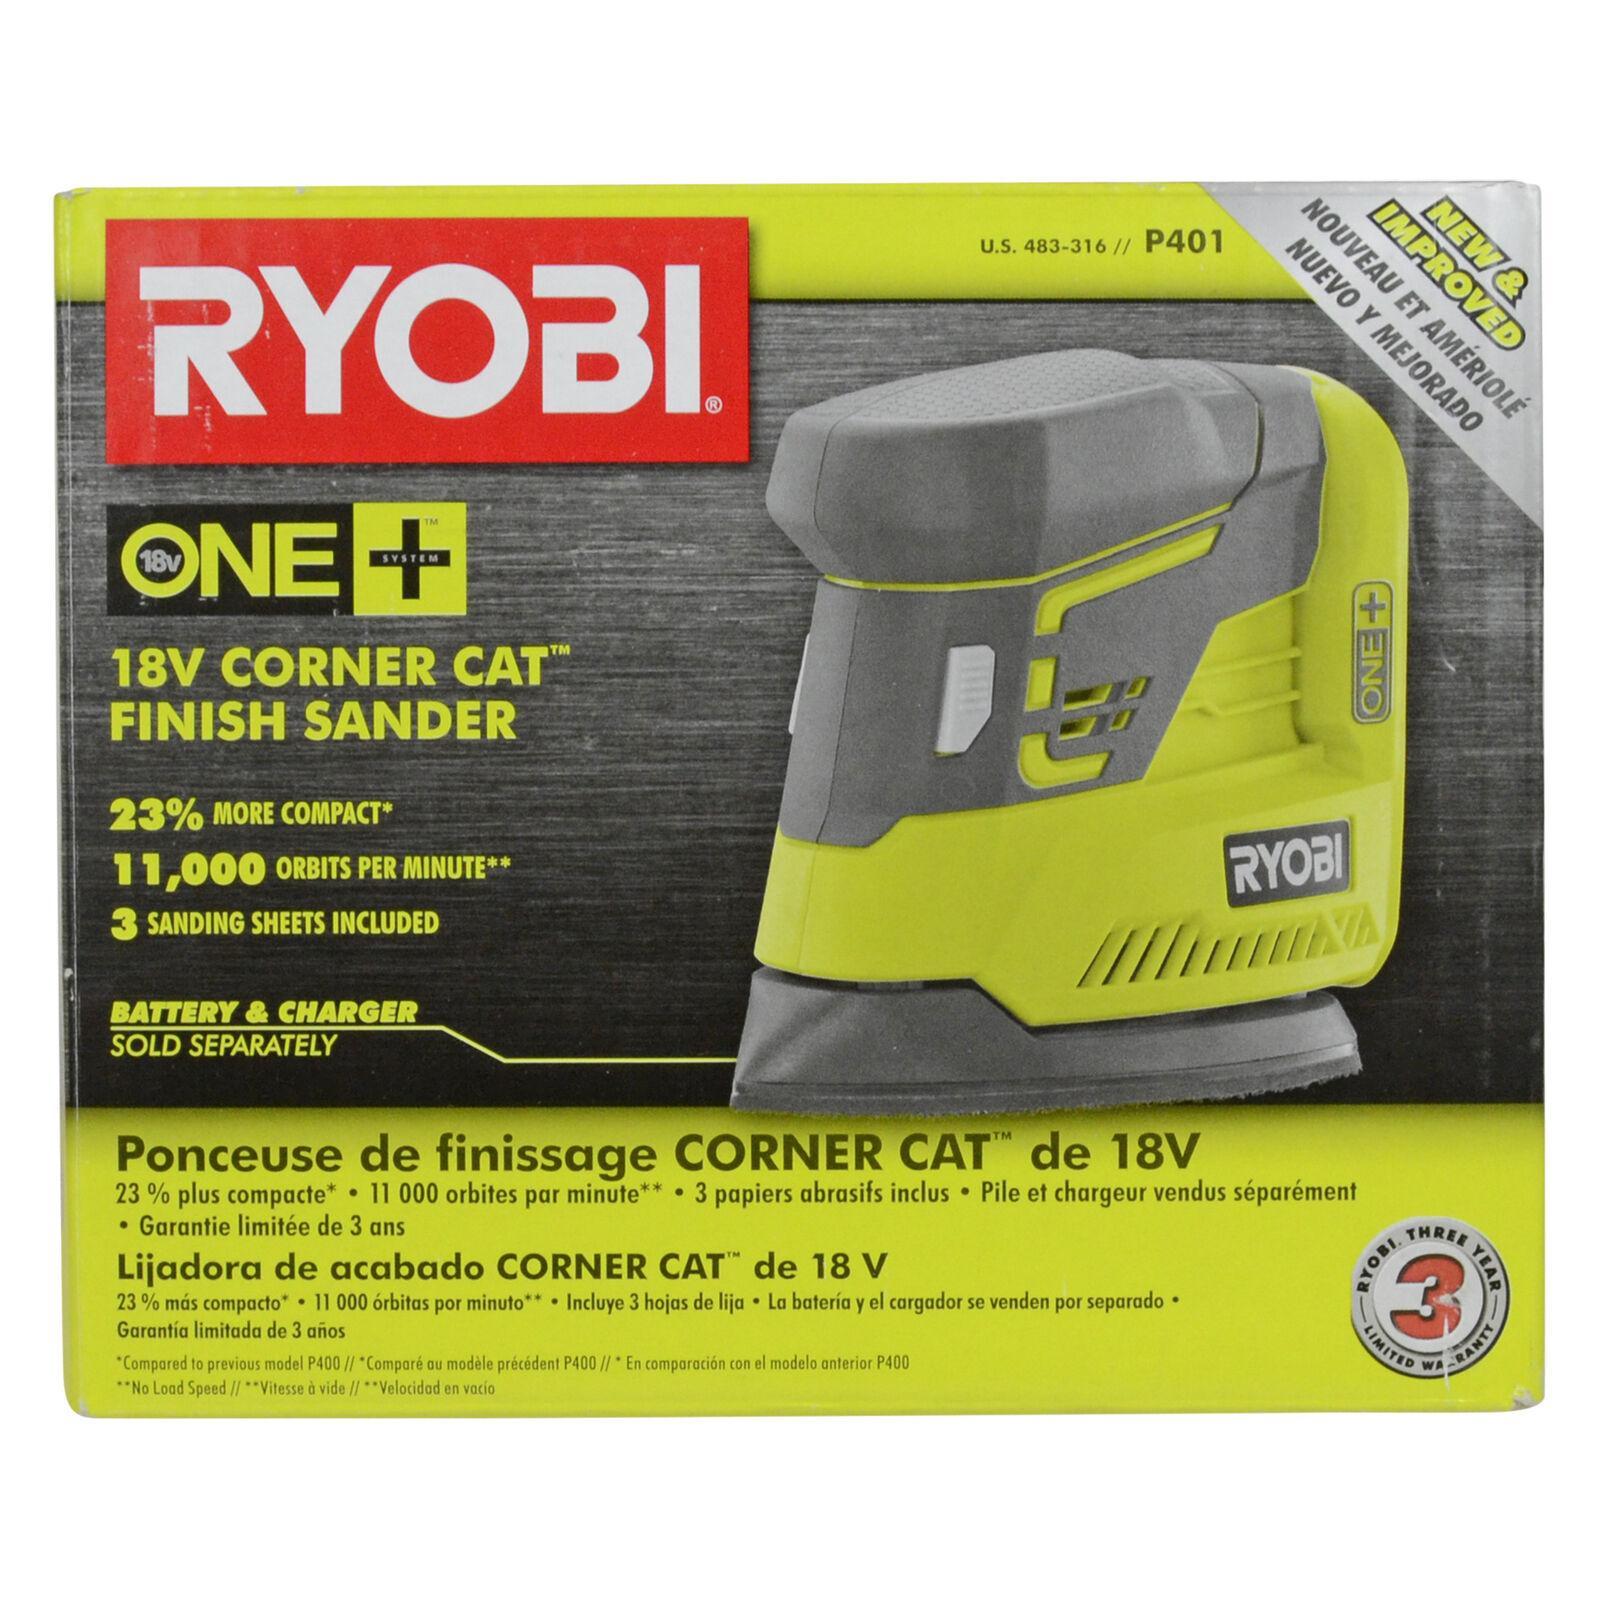 Ryobi P401 18V One+ Lithium Ion Corner Cat Finish Sander uses P102 P104 P107